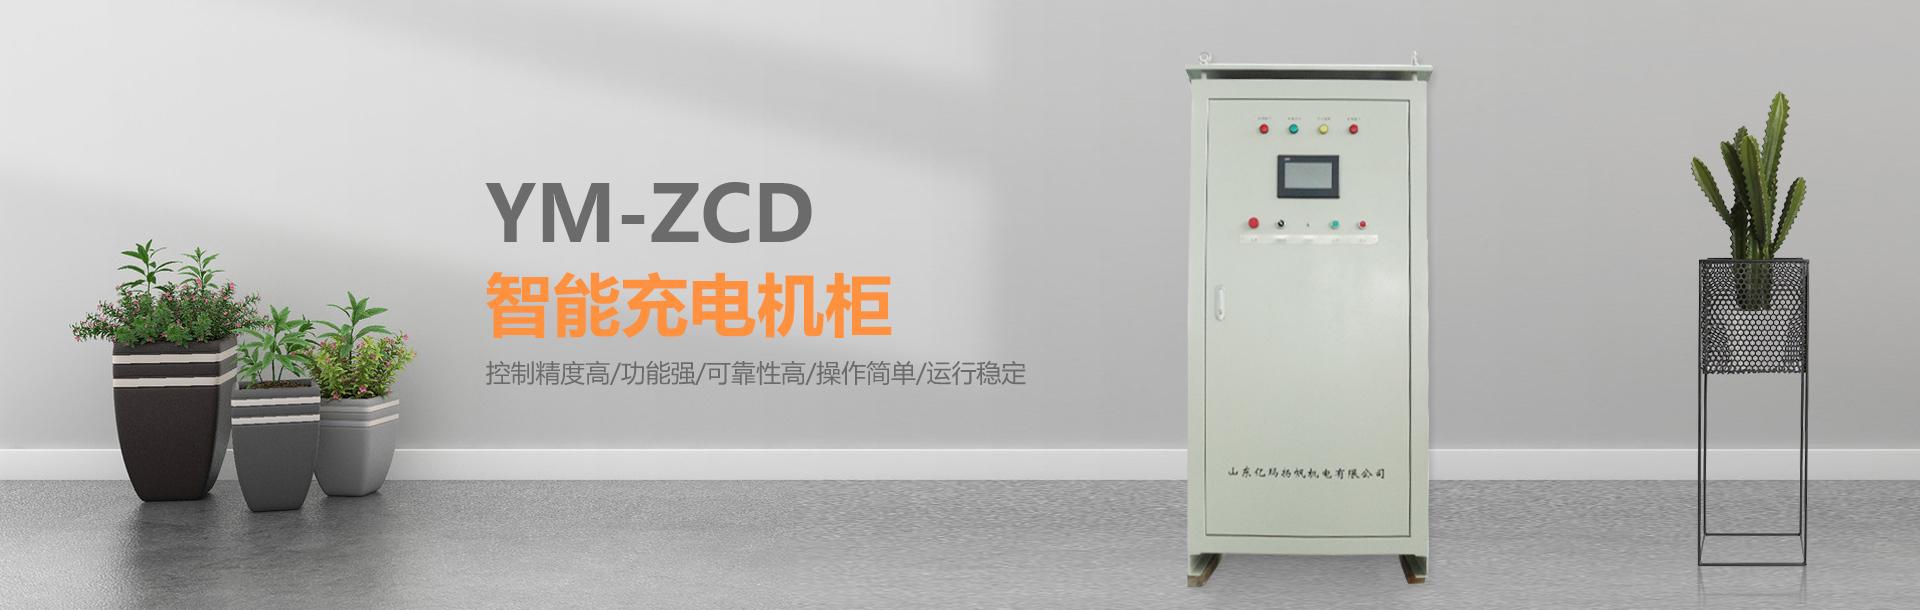 YM-ZCD智能充电机柜